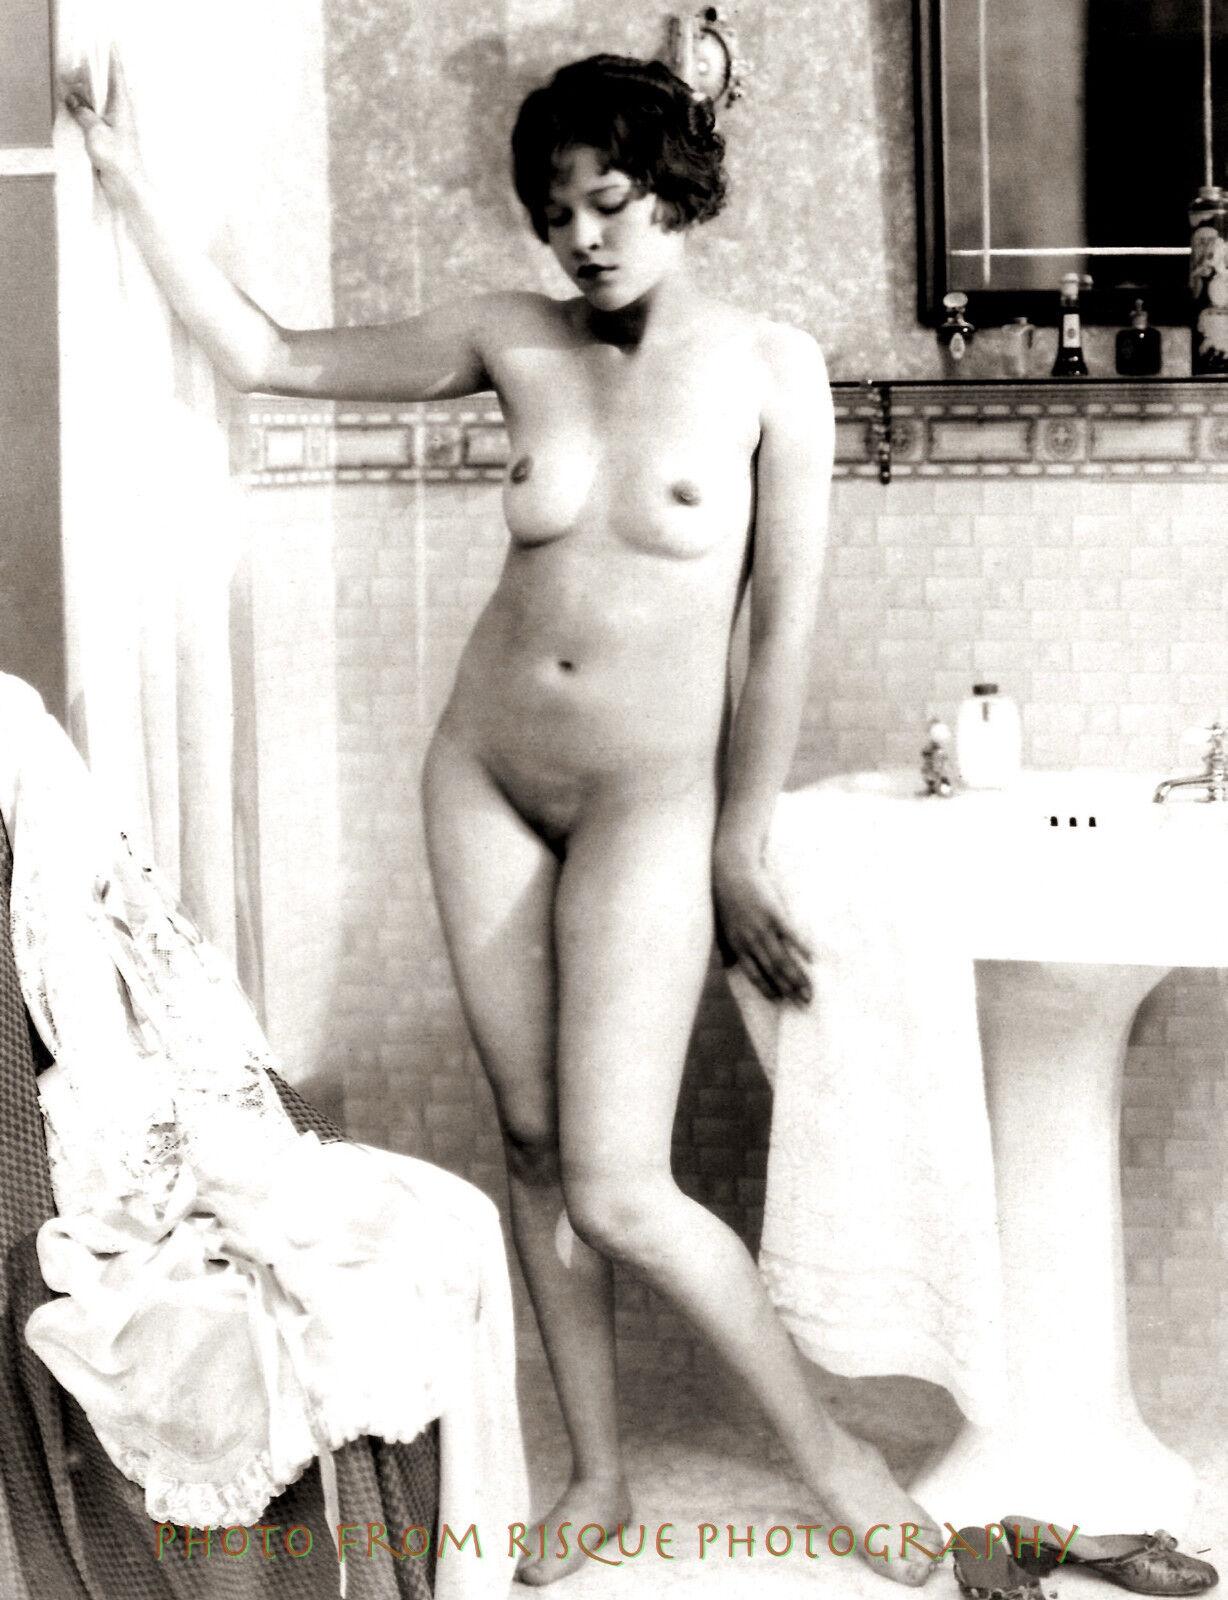 Debra wilson shows boobs